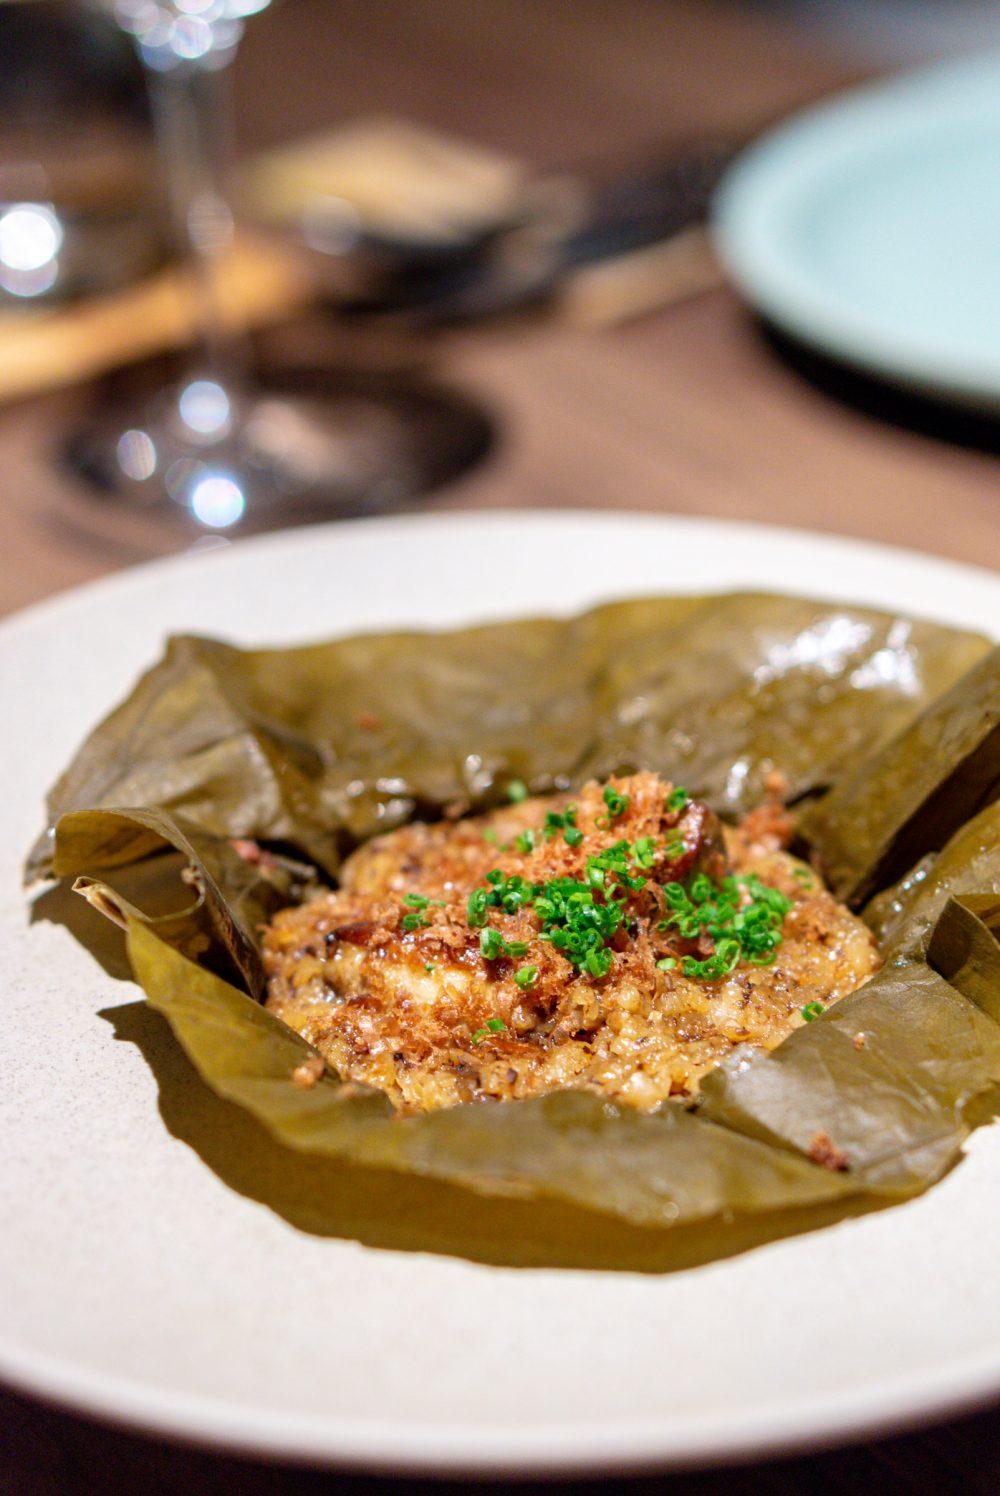 Restaurant-Ibid-Woo-Wai-Leong-Lotus-Rice-3-1000x1496.jpg